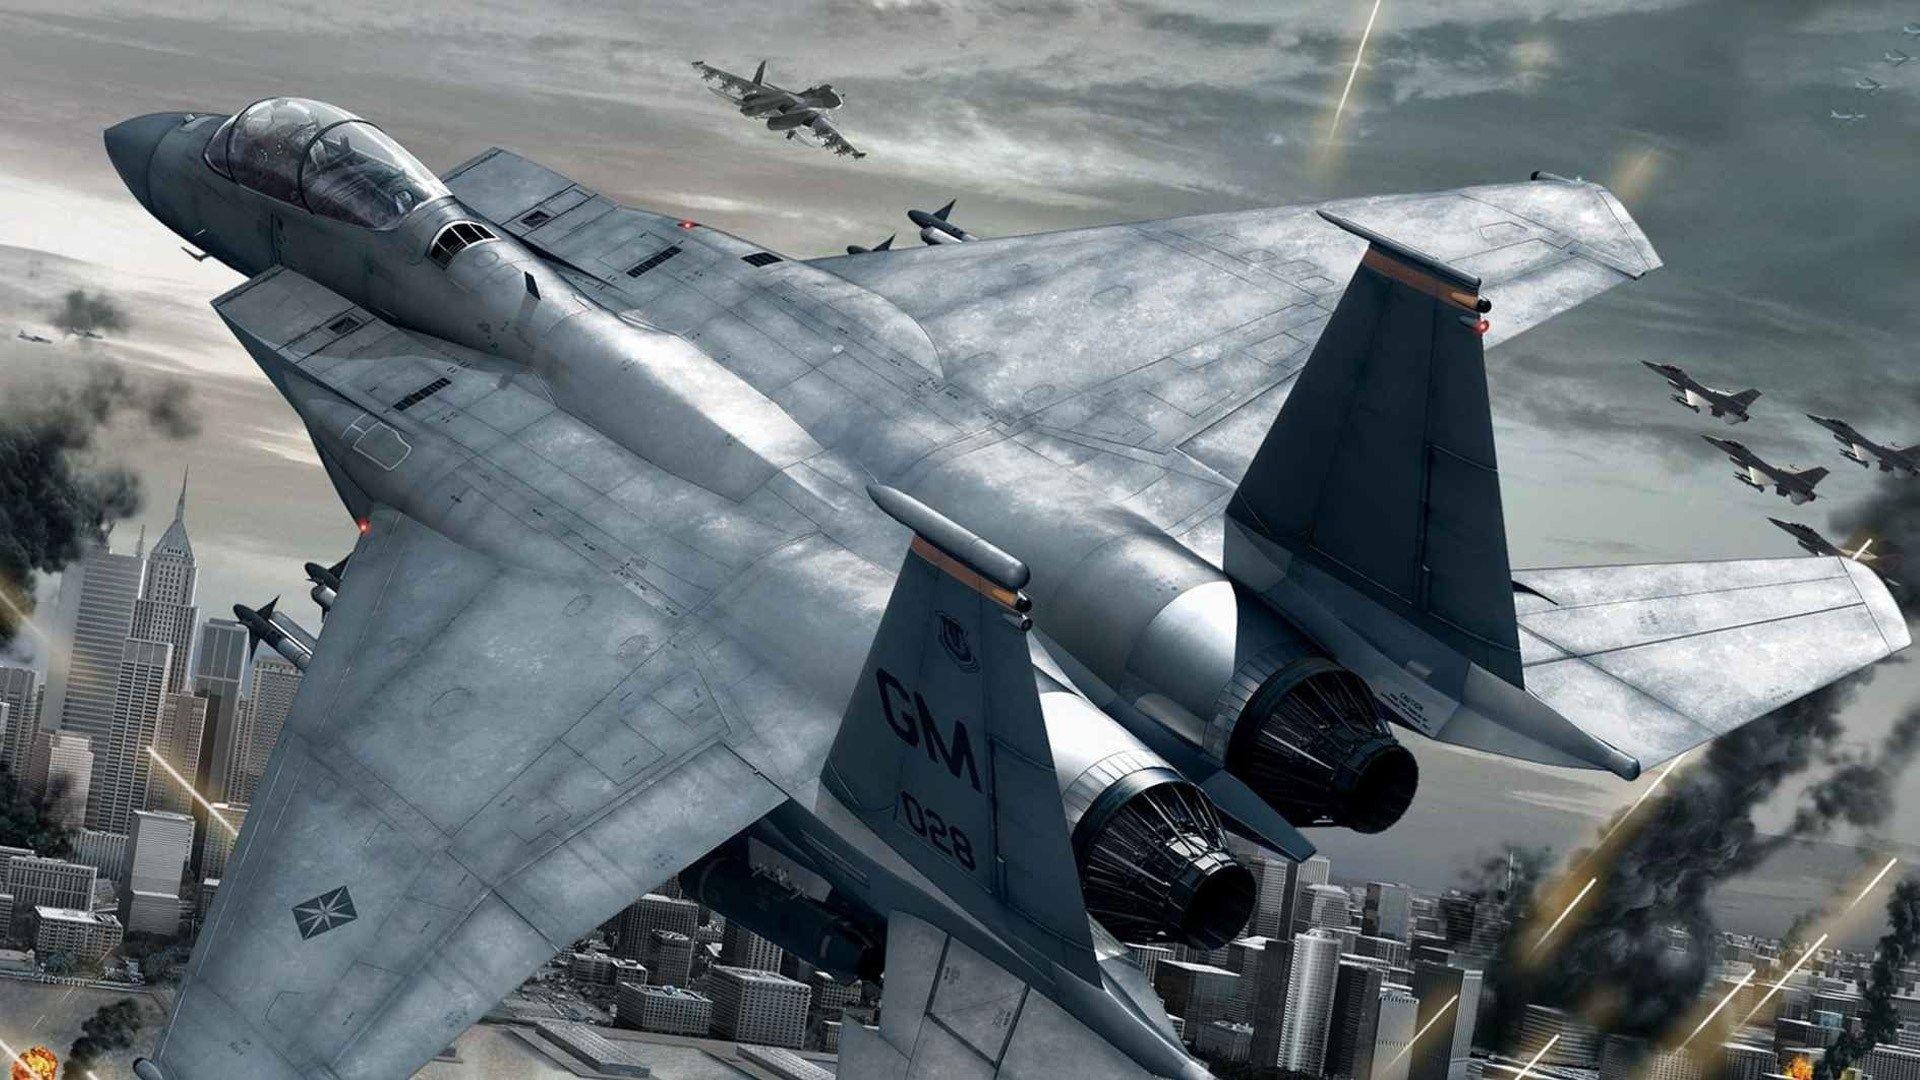 Ace Combat wallpaper image hd